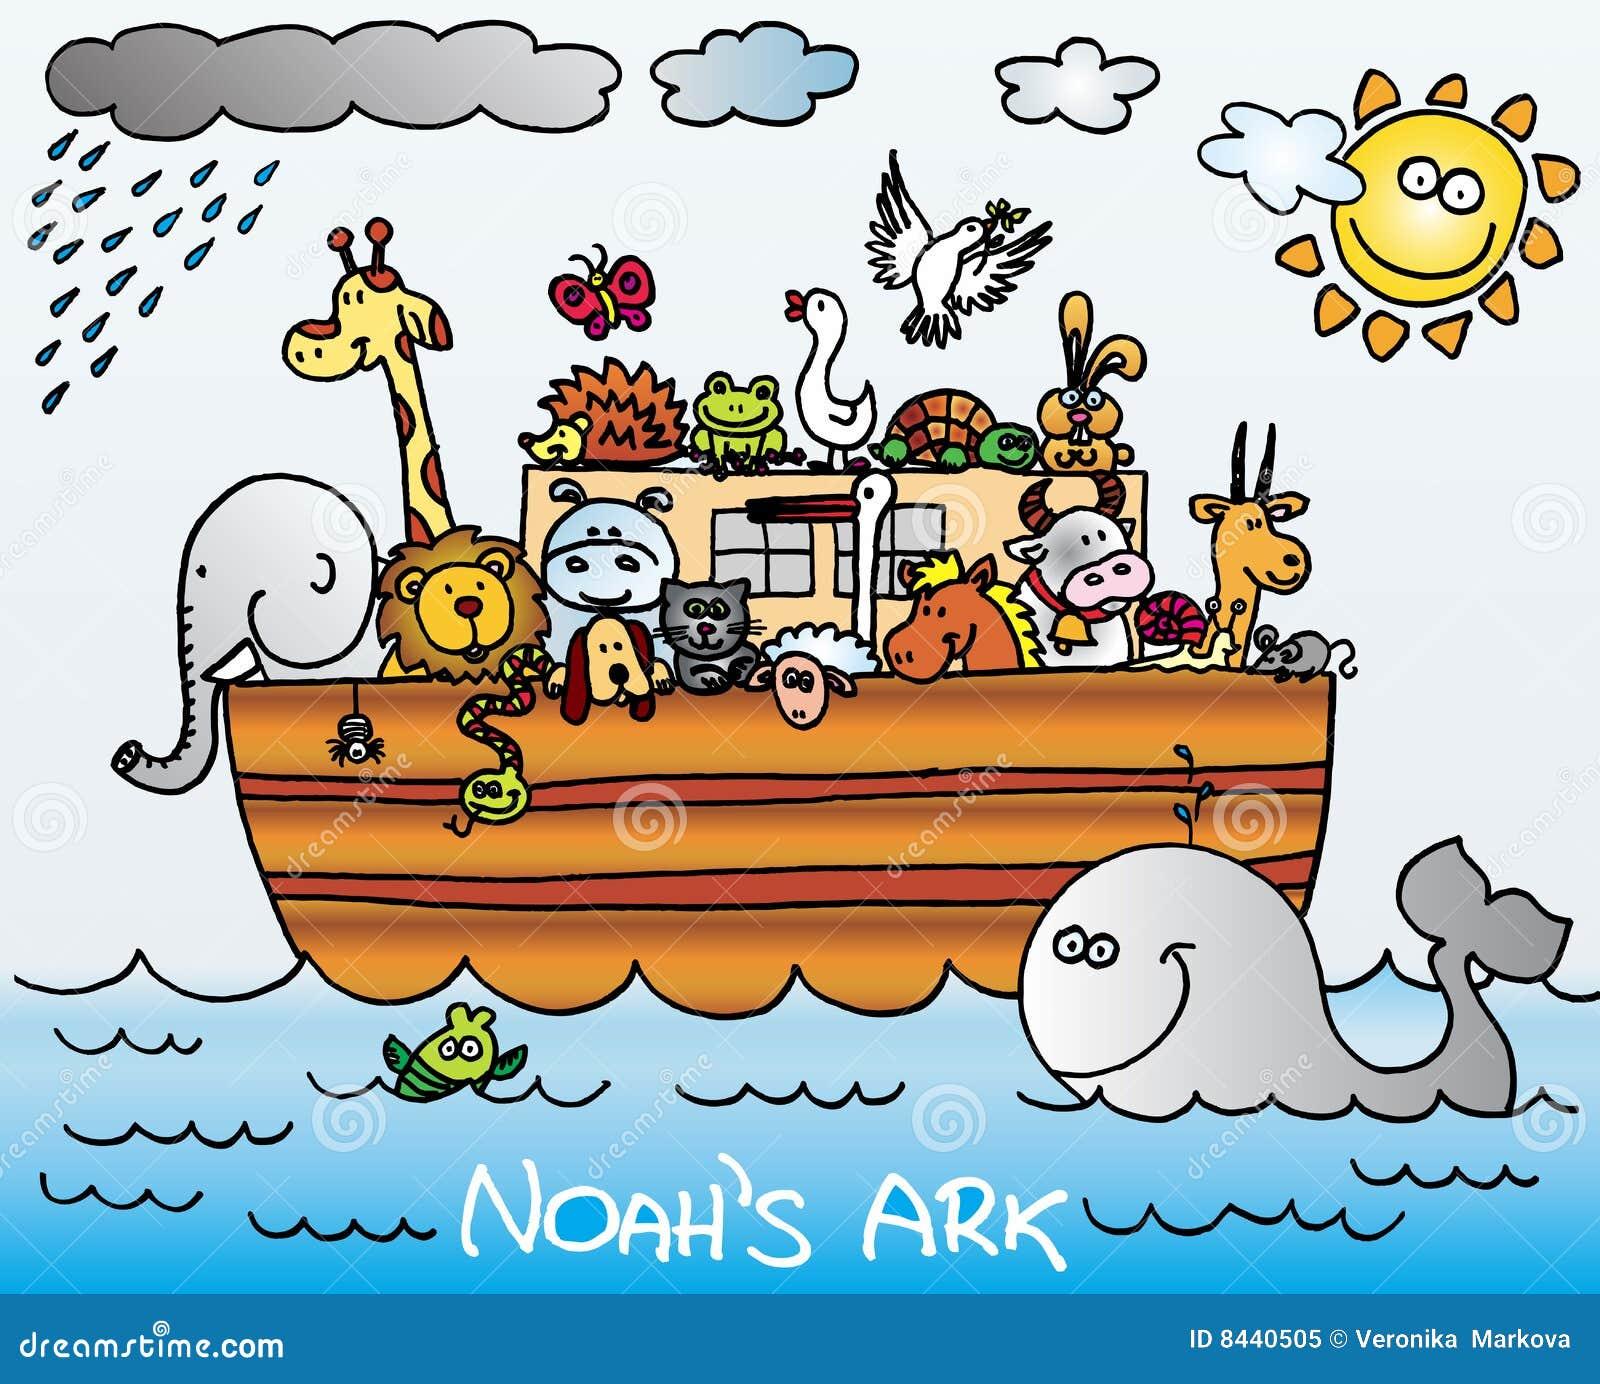 noahs arche lizenzfreies stockfoto bild 8440505. Black Bedroom Furniture Sets. Home Design Ideas